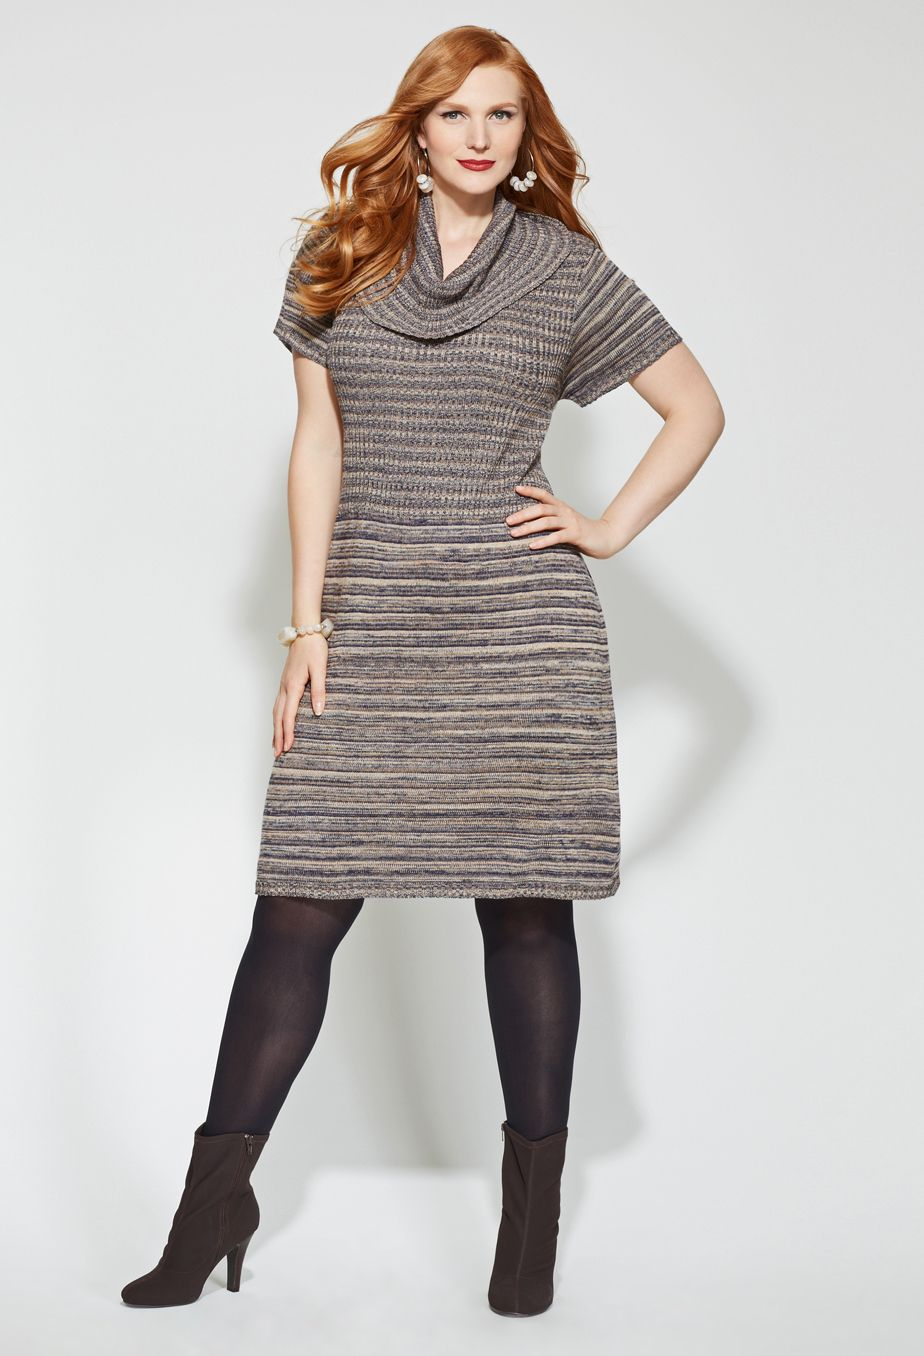 Space Dye Sweater Dress Plus Size Dresses Sweater Dress Winter Fashion Outfits